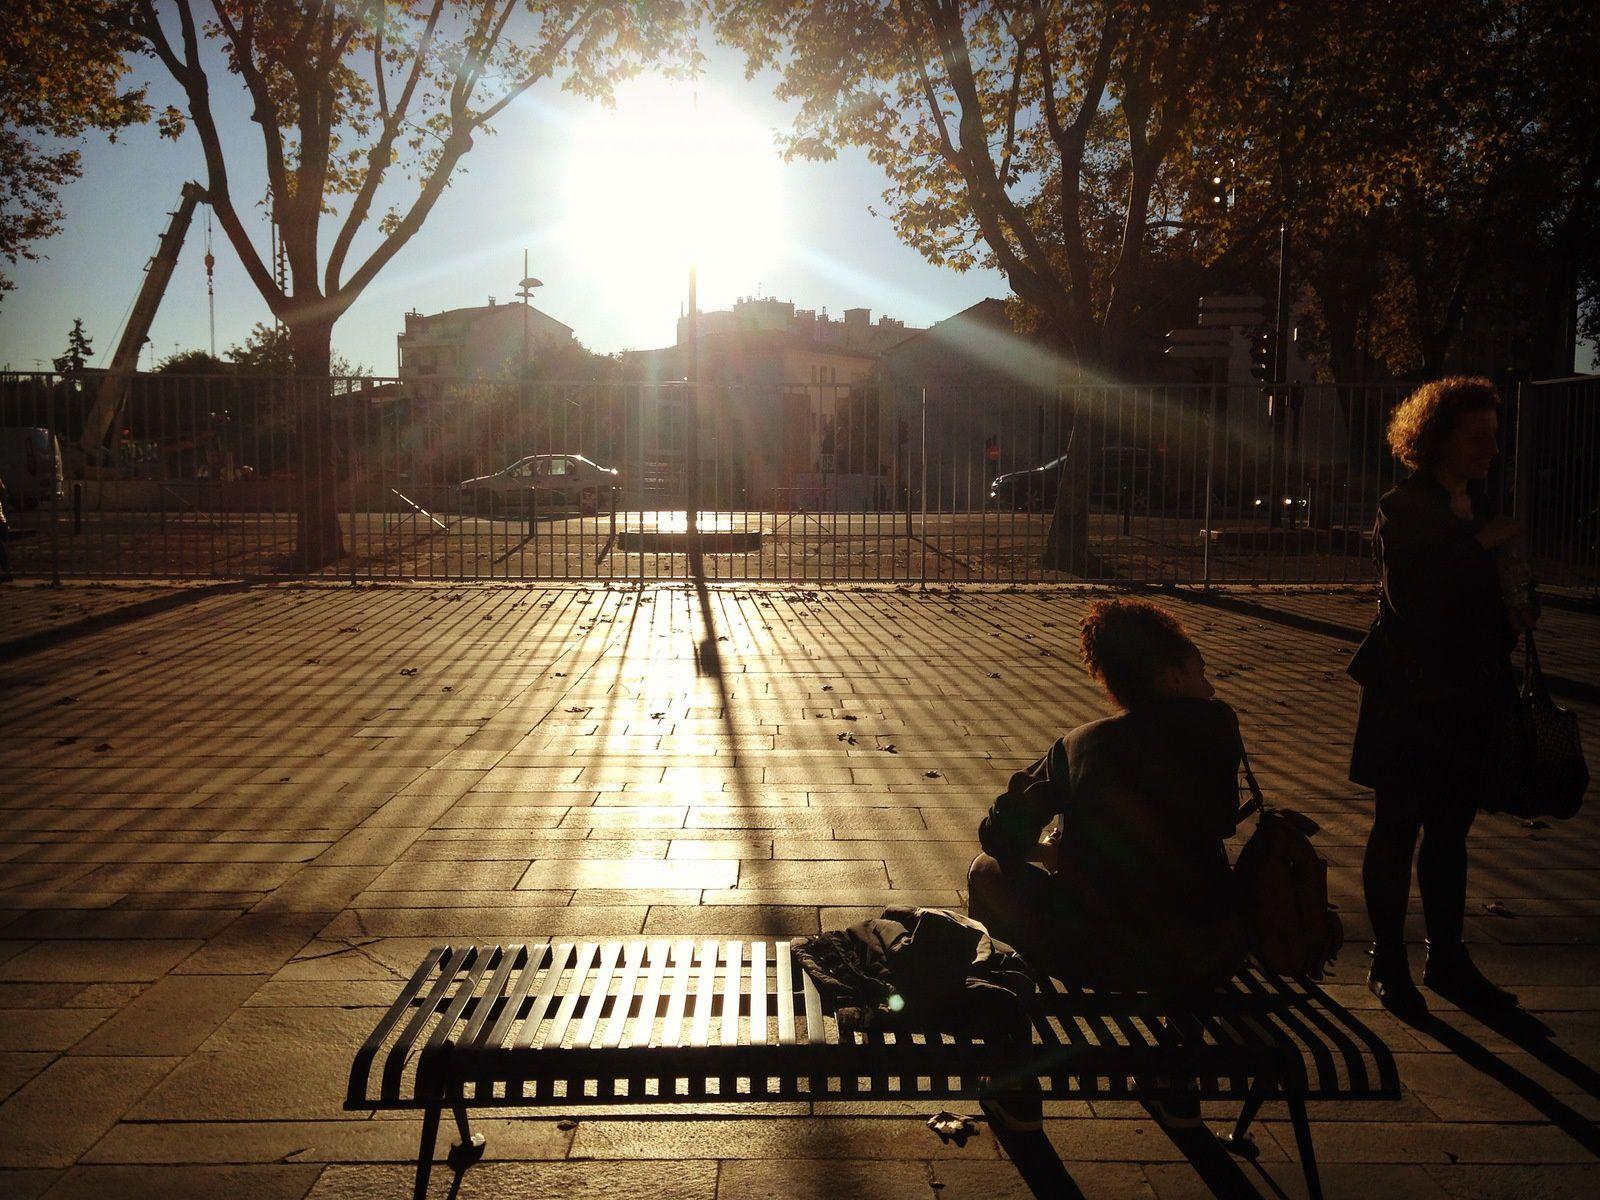 ), Cassis (France 2012), Mirajes-Mirages (Londres), Sin horizonte-Sans horizon(Barcelona), Saveur de l'enfance- con sabor a la infancia (Marseille, Fr)  Morceau de ville_ ciudad a llevarse (Toulouse, Fr), Habana trip (Cuba 2011), Le dernier métro - el último metro (Paris, 2012), En la Calle- dans la rue (Cuba, 2011), Monde souterrain- Mundo subterraneo (Bcn), Plantar sus pies como dos raíces- Planter ses pieds comme deux racines, Et les fleurs- Y las flores,  Postal de Girona, Le Nid- el nido, Trio (Paris, la Concorde), Pense-bête, Vole! Vuele! (Dune du Pyla, Fr) Otoño, Automne, Senso unico, Roma (Italia), Viñales (Cuba